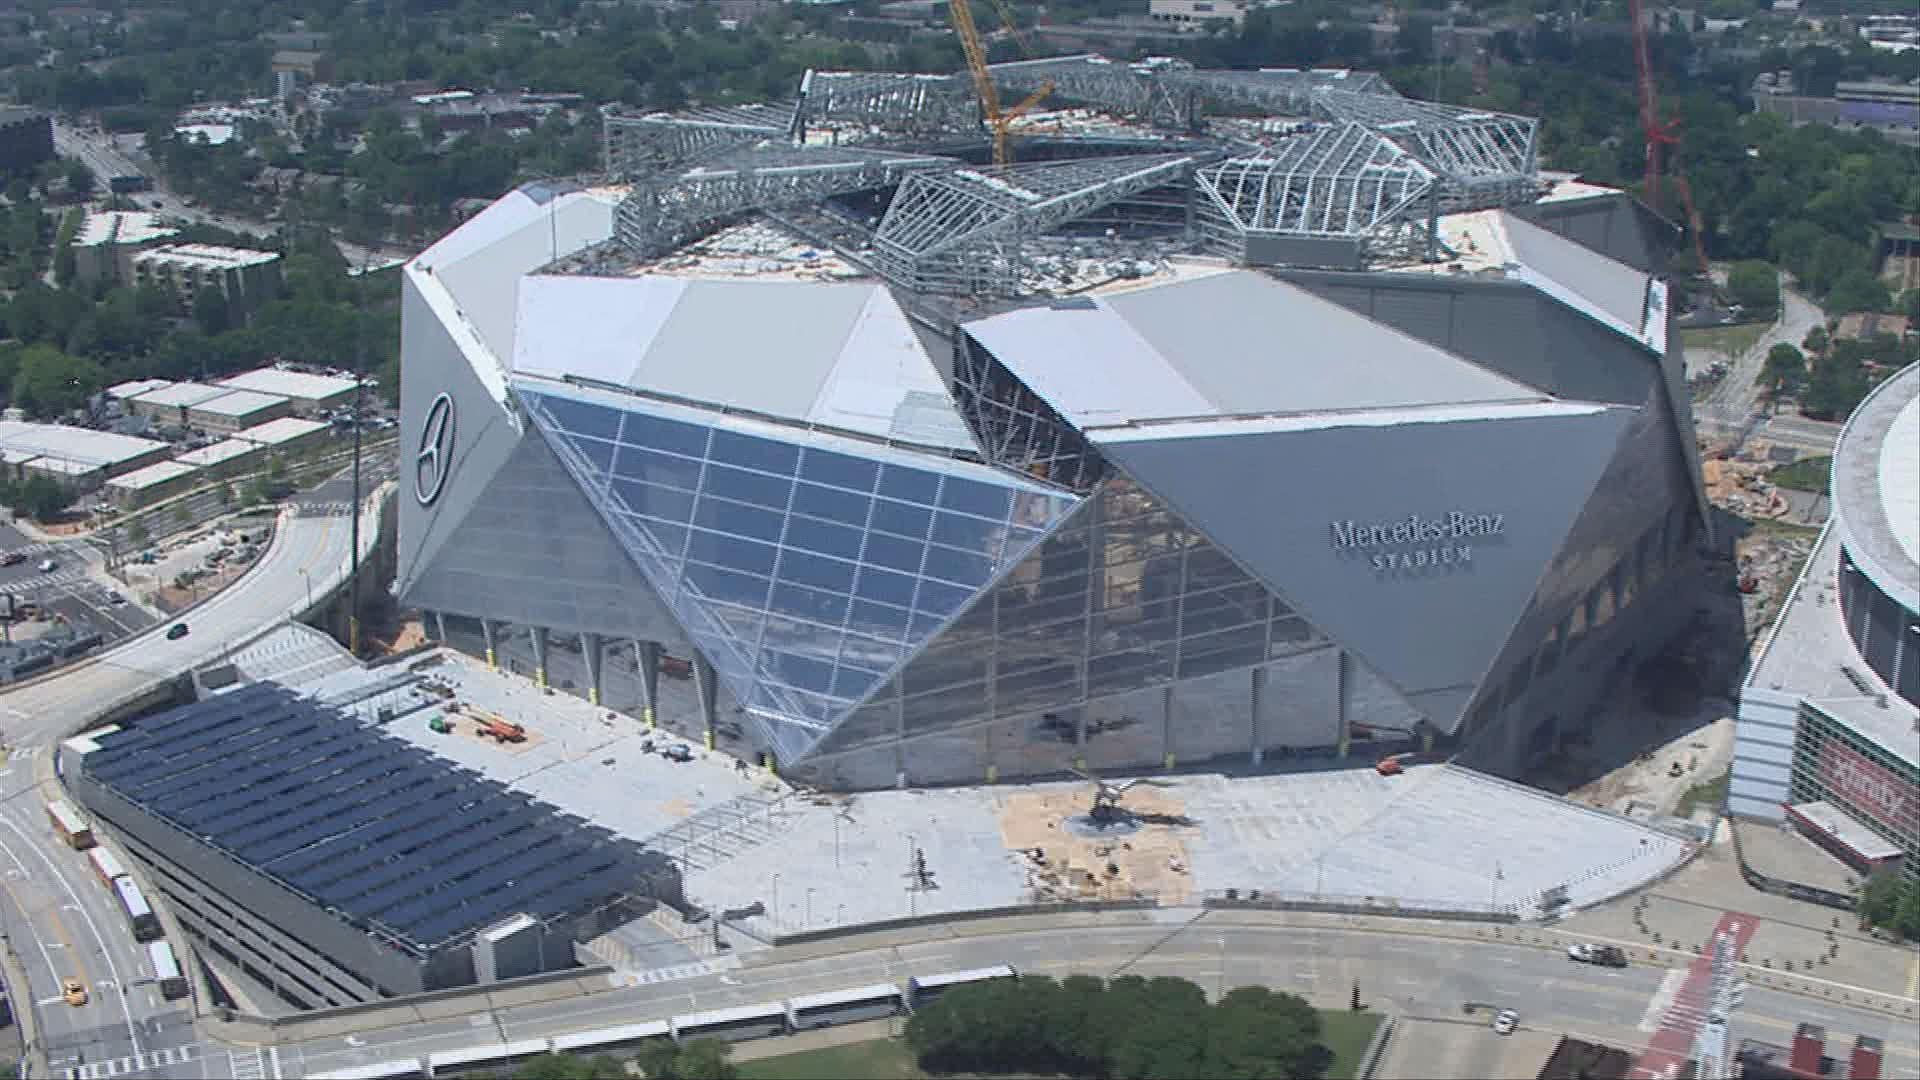 Mercedes Benz Stadium Opens Its Doors Full